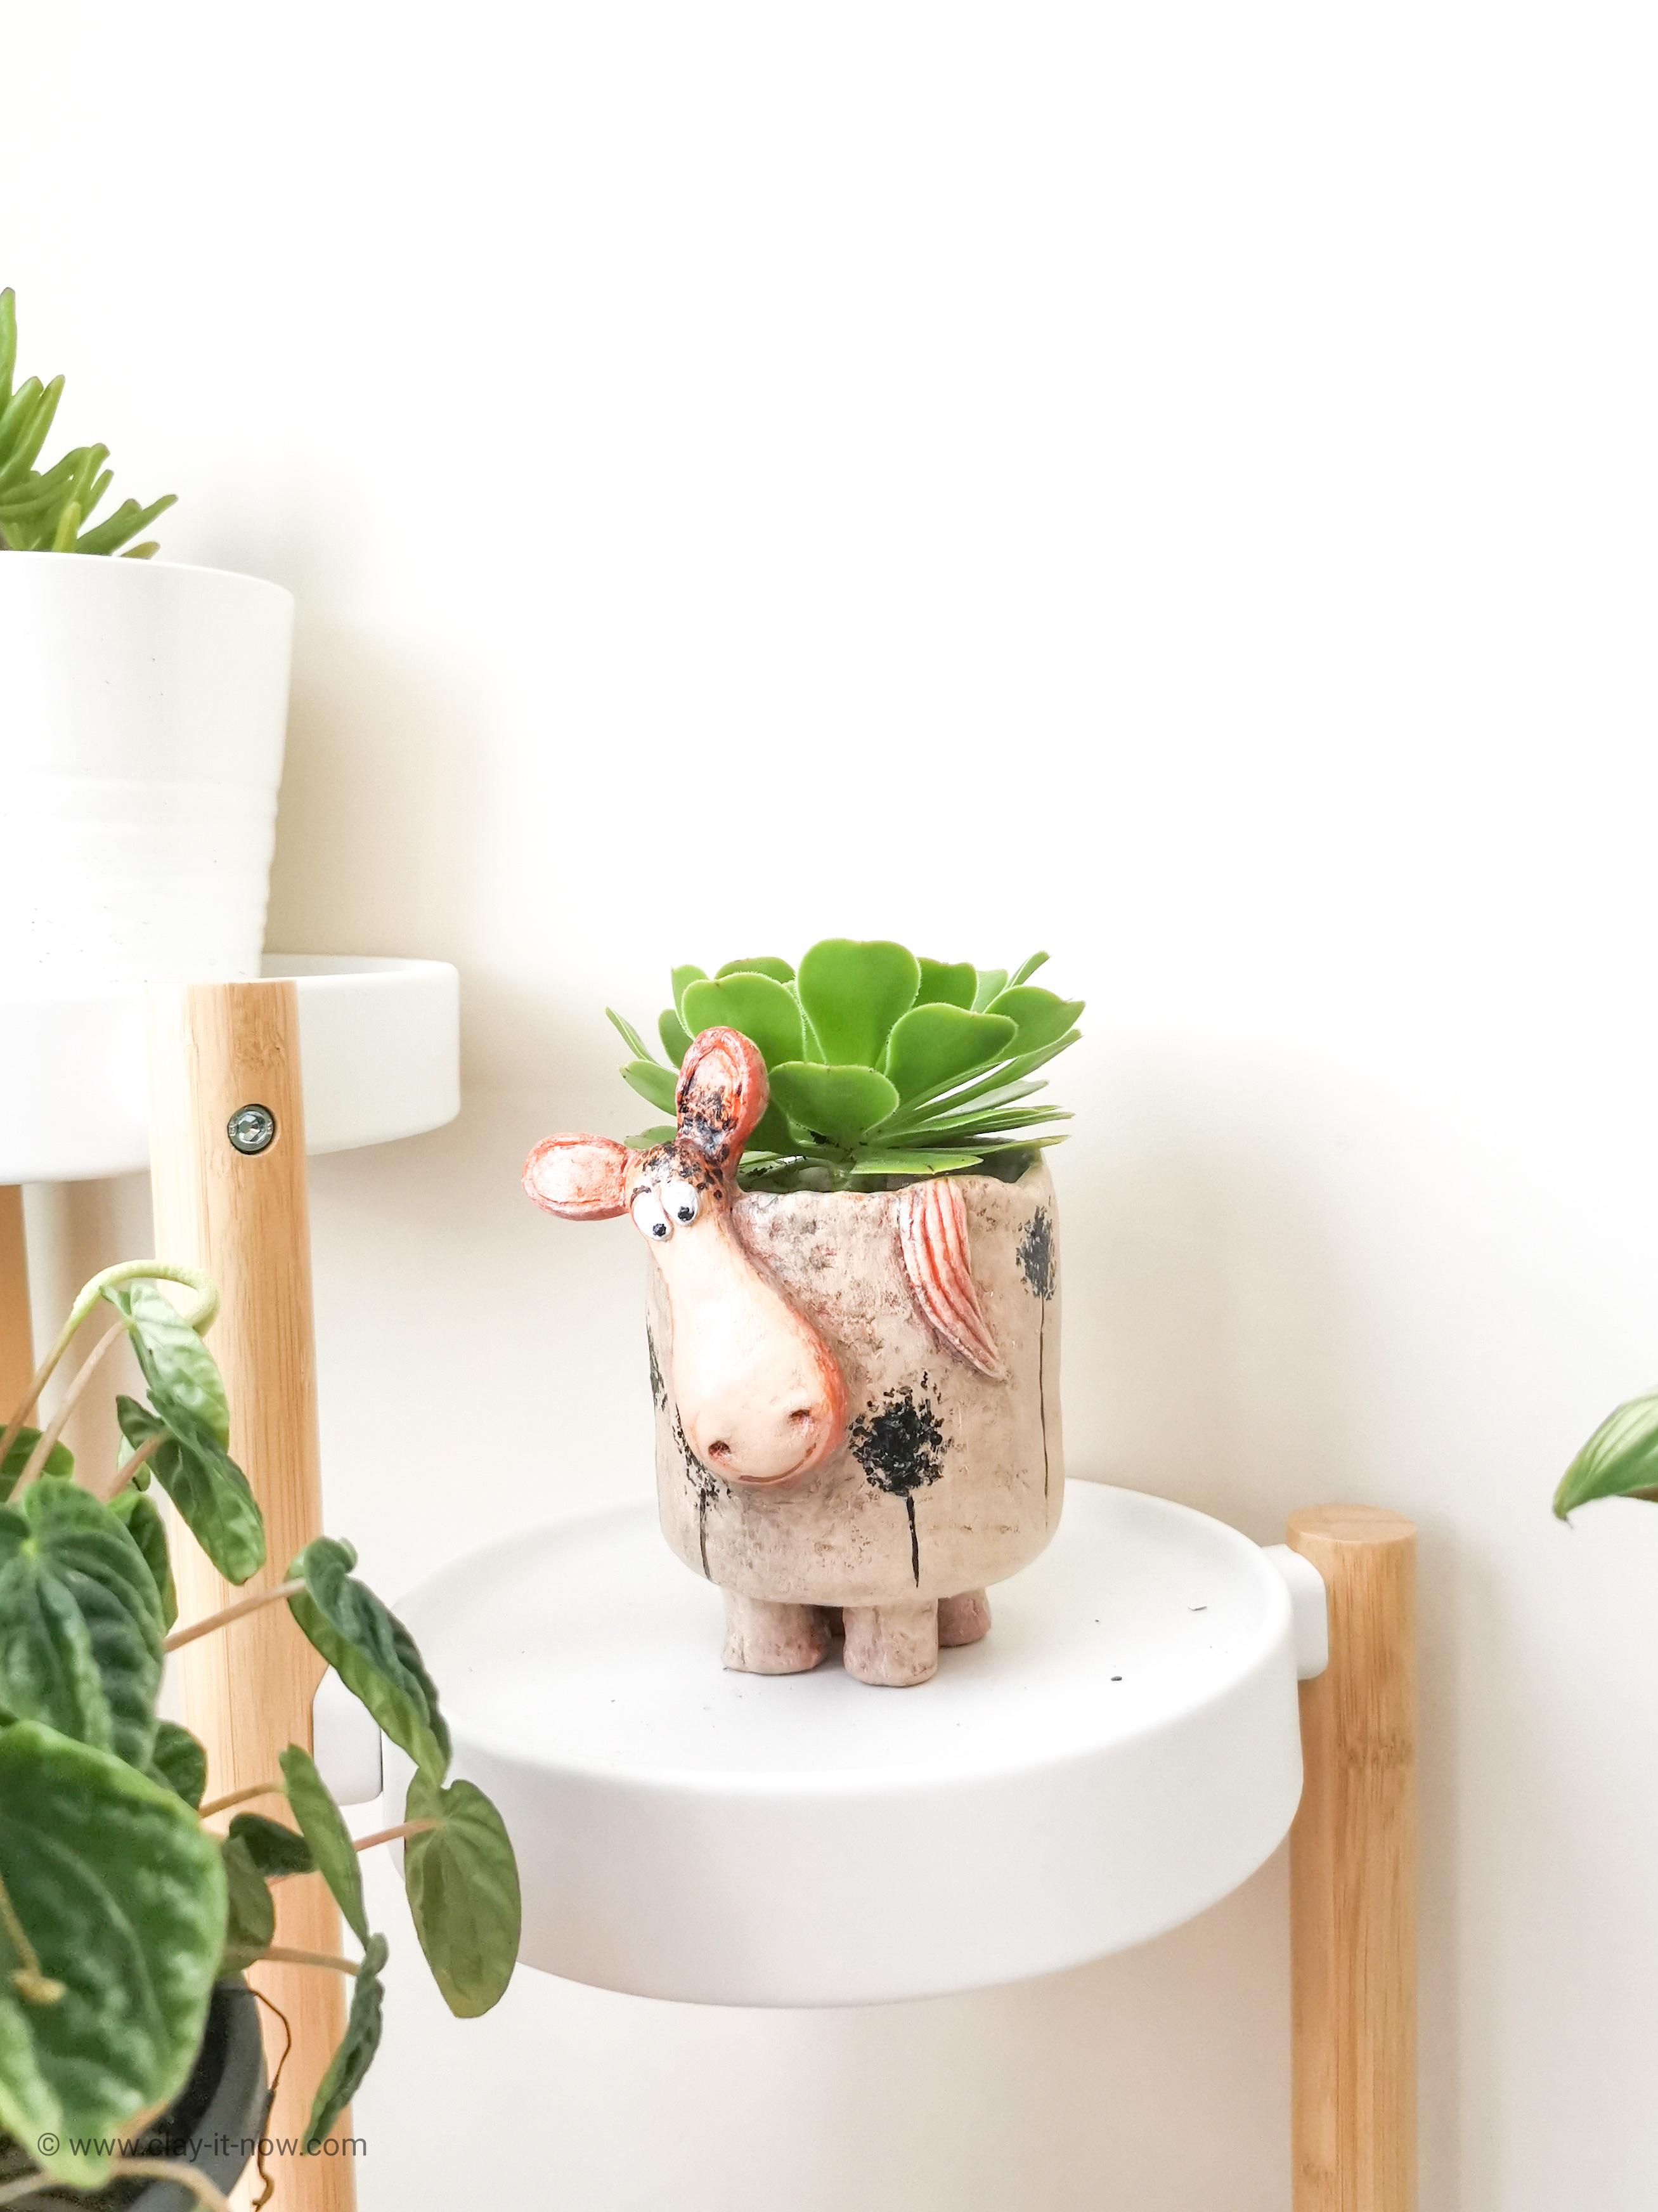 donkey planter - copycat pottery - clayitnow-1